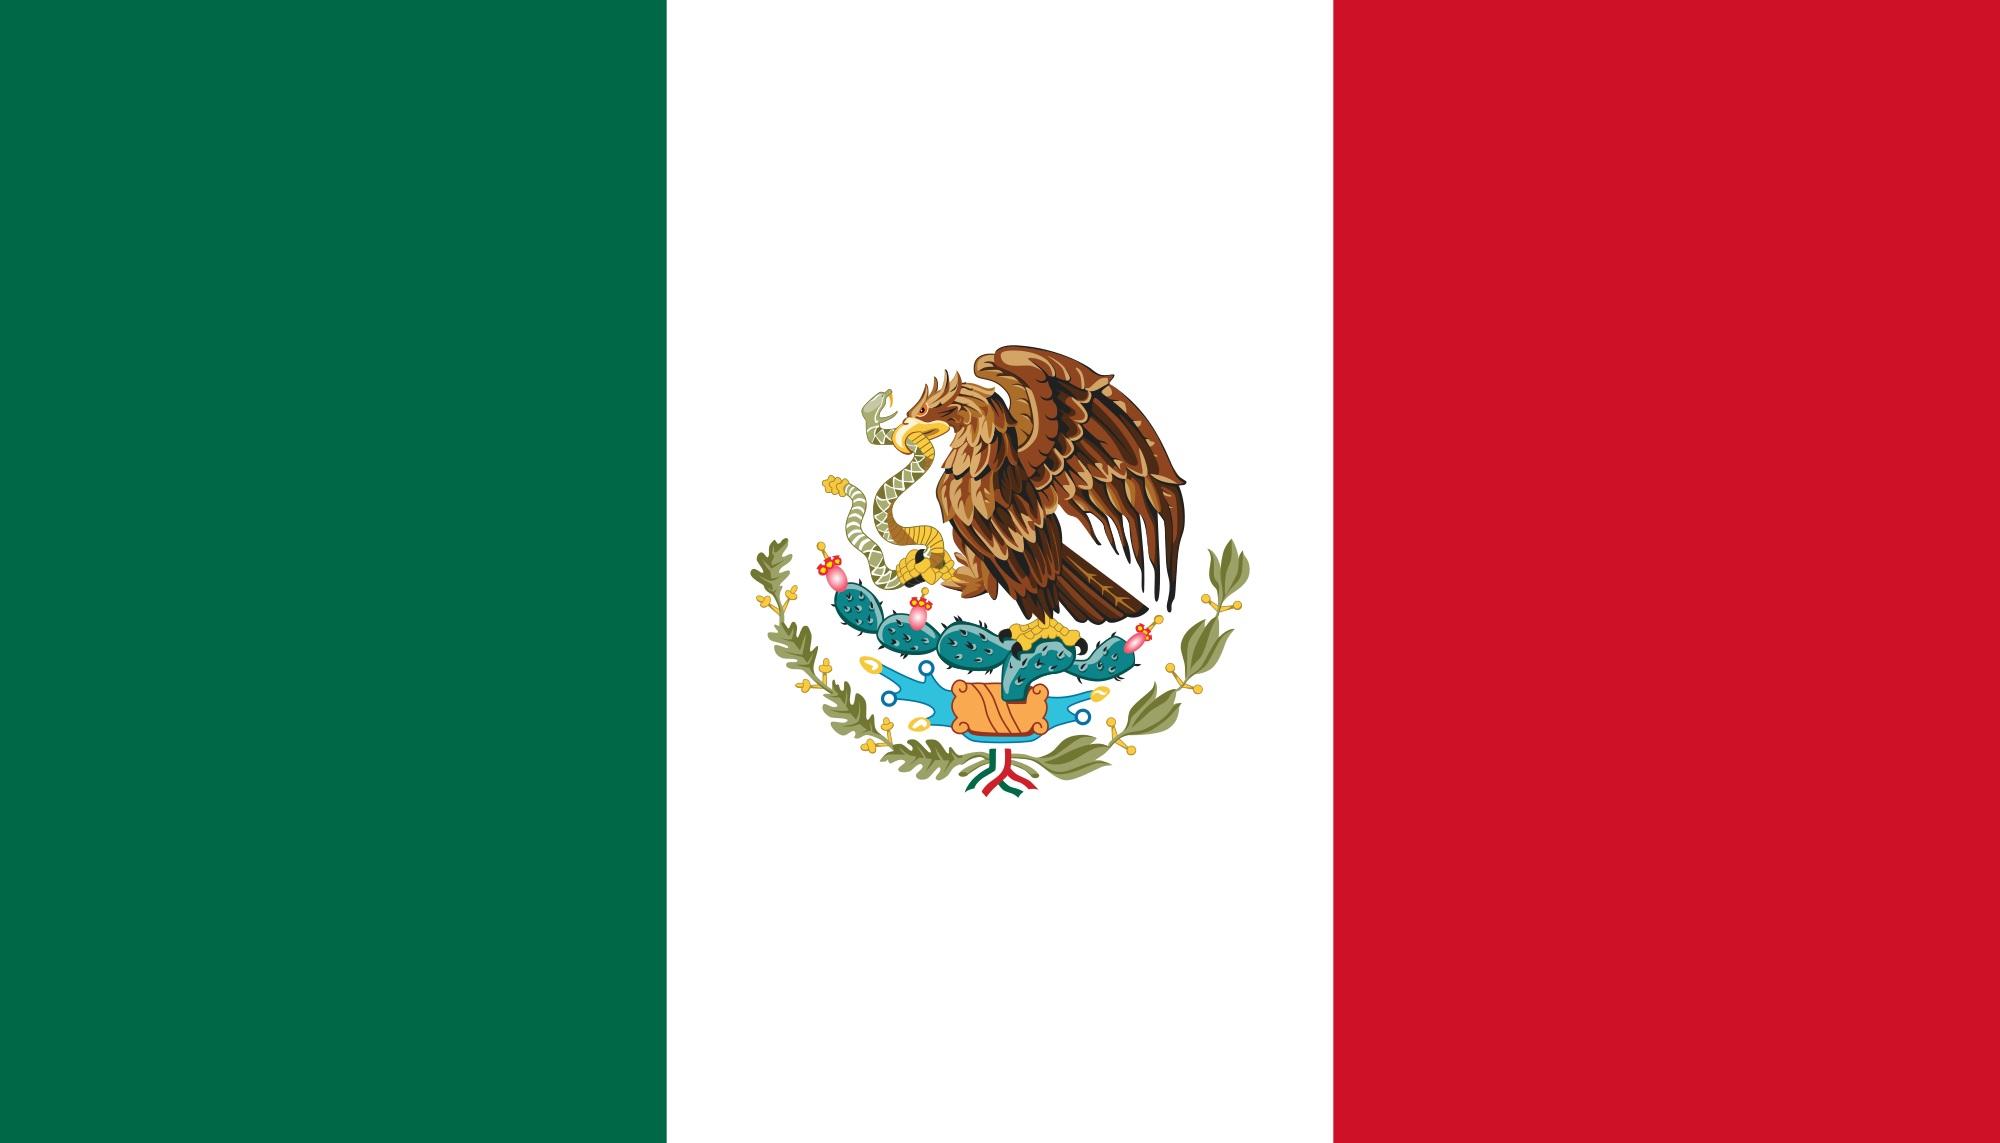 7500 MEXICO Verified website Traffic